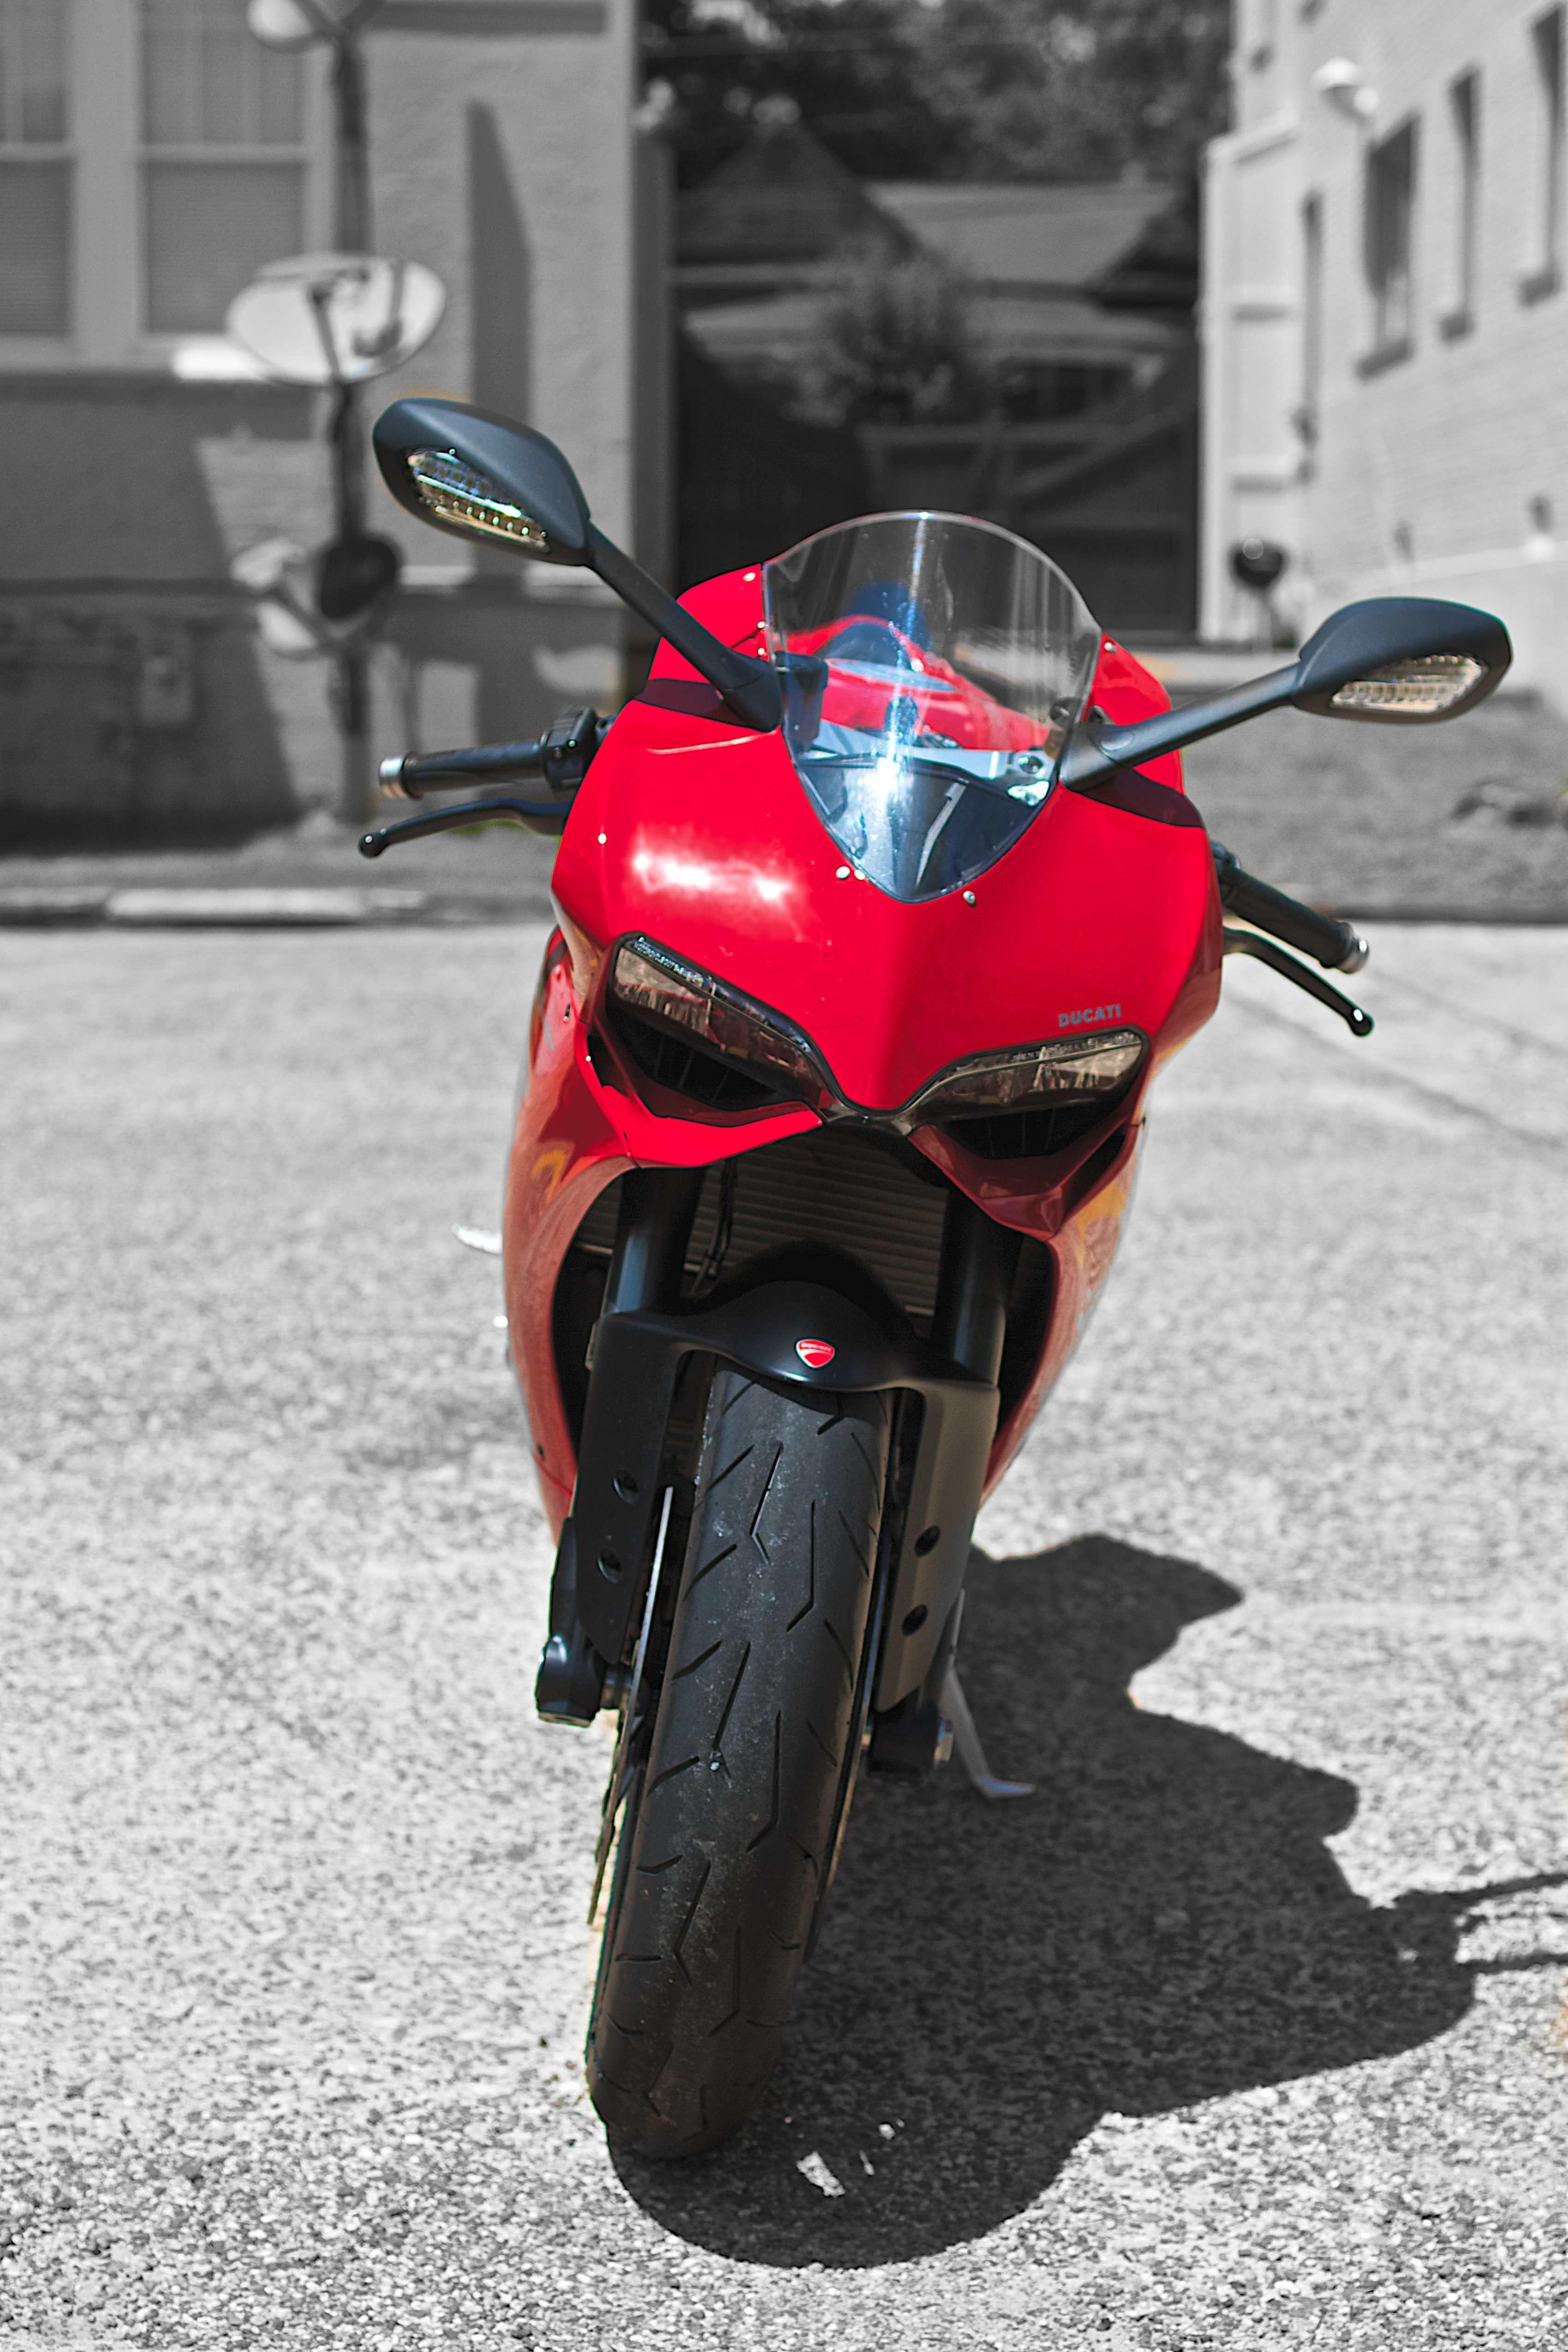 2014 Ducati Panigale 899 Ducati, Motorcycle, Super bikes